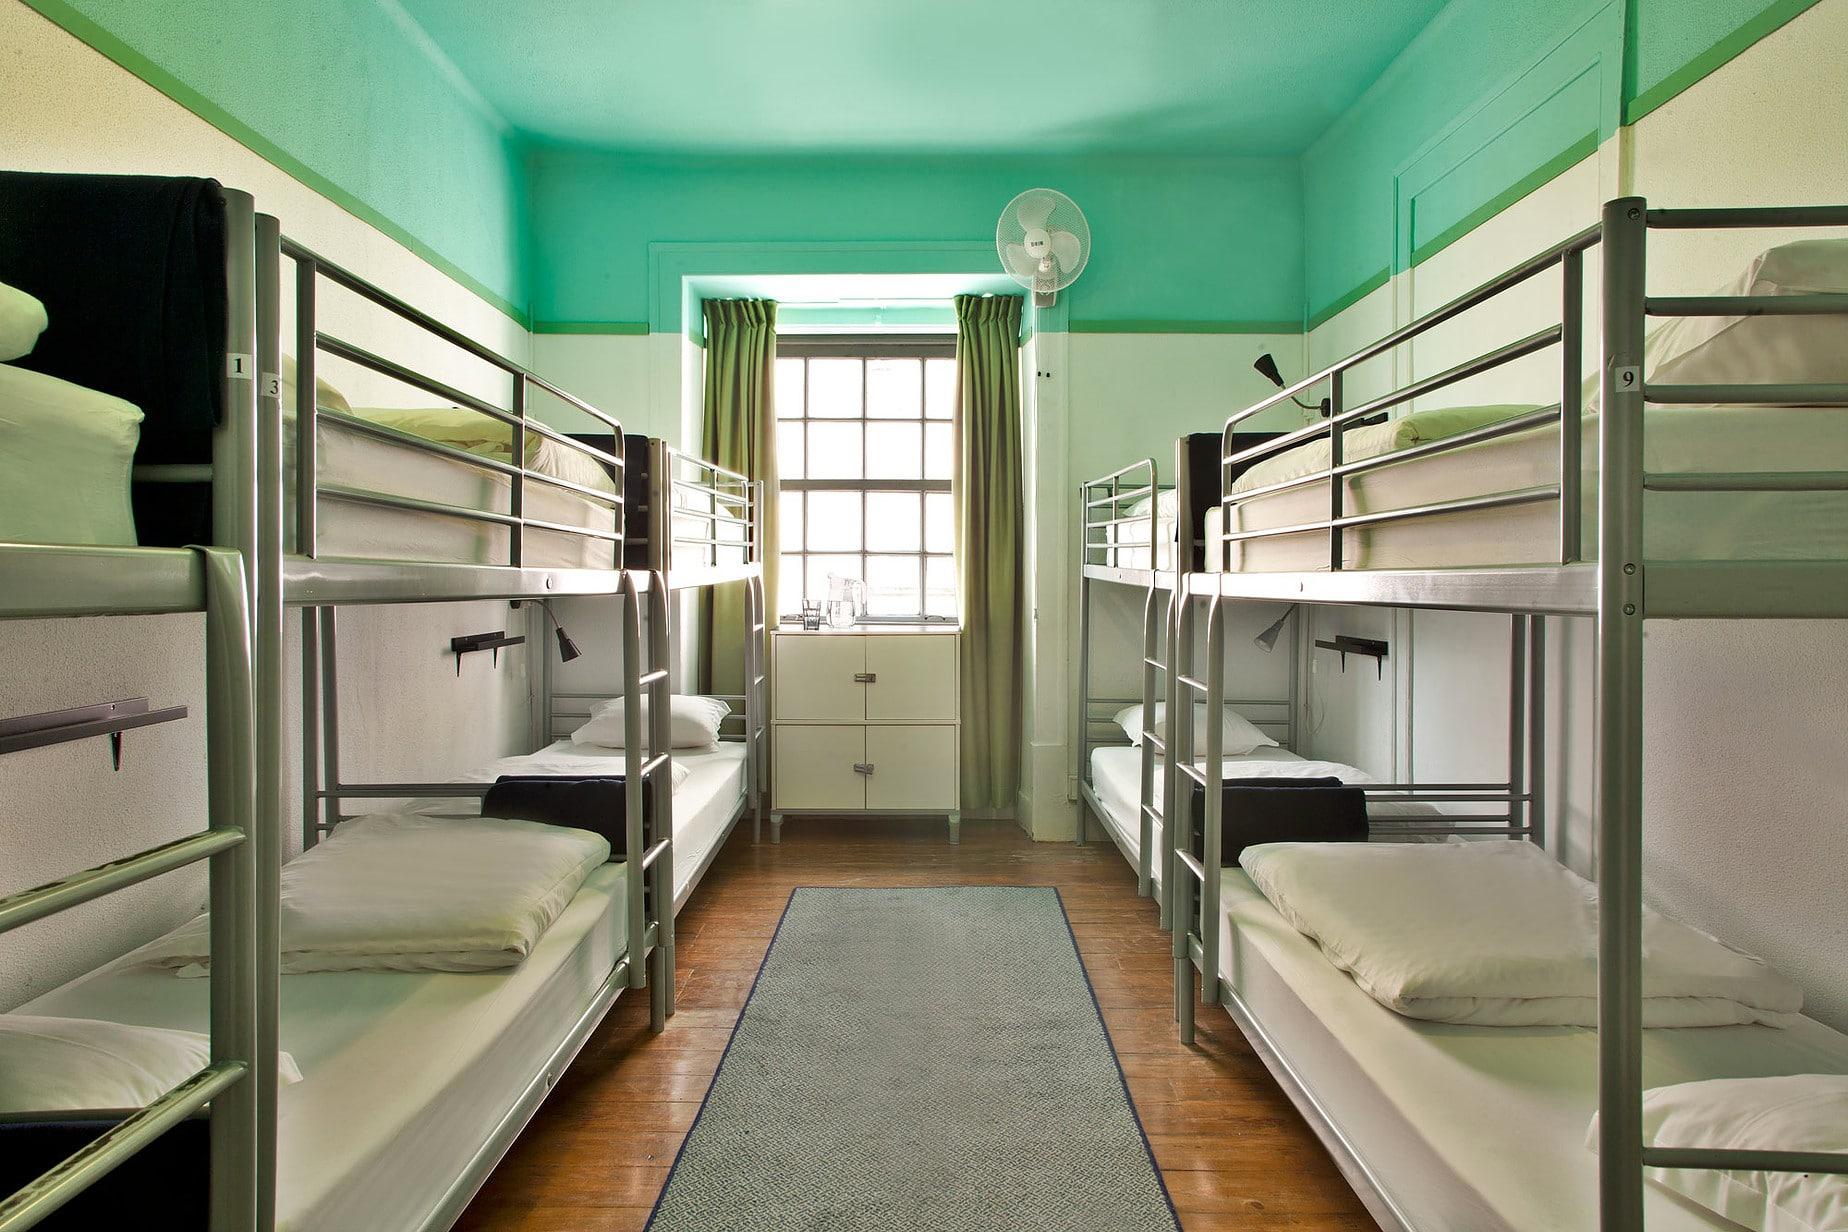 le goodmorning hostel la meilleure auberge de jeunesse. Black Bedroom Furniture Sets. Home Design Ideas